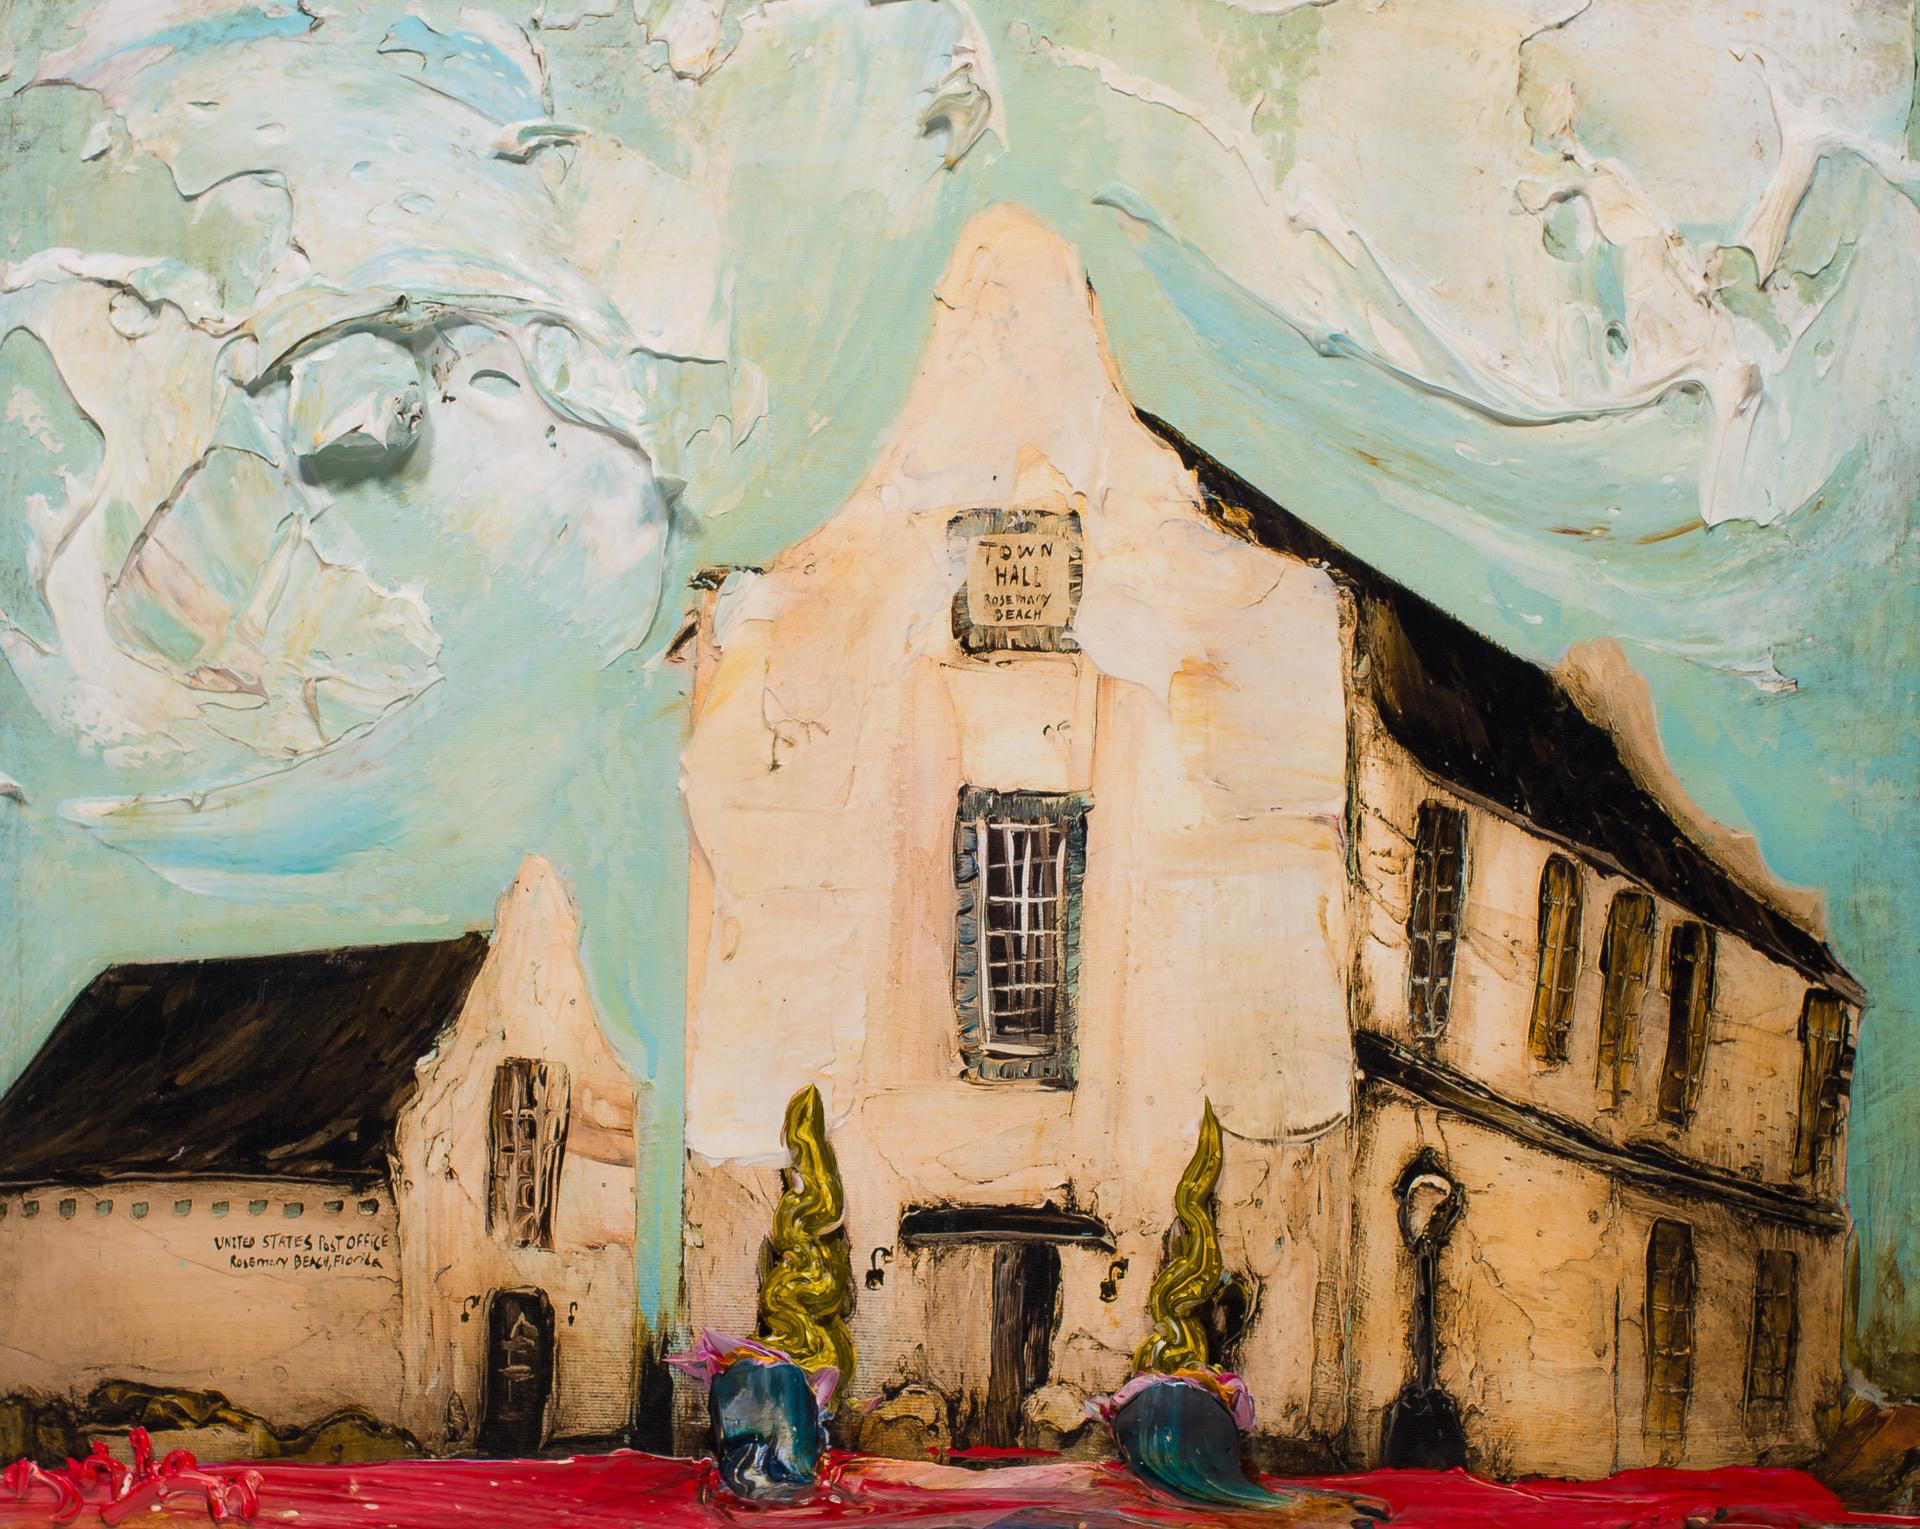 ROSEMARY BEACH TOWN HALL by JUSTIN GAFFREY